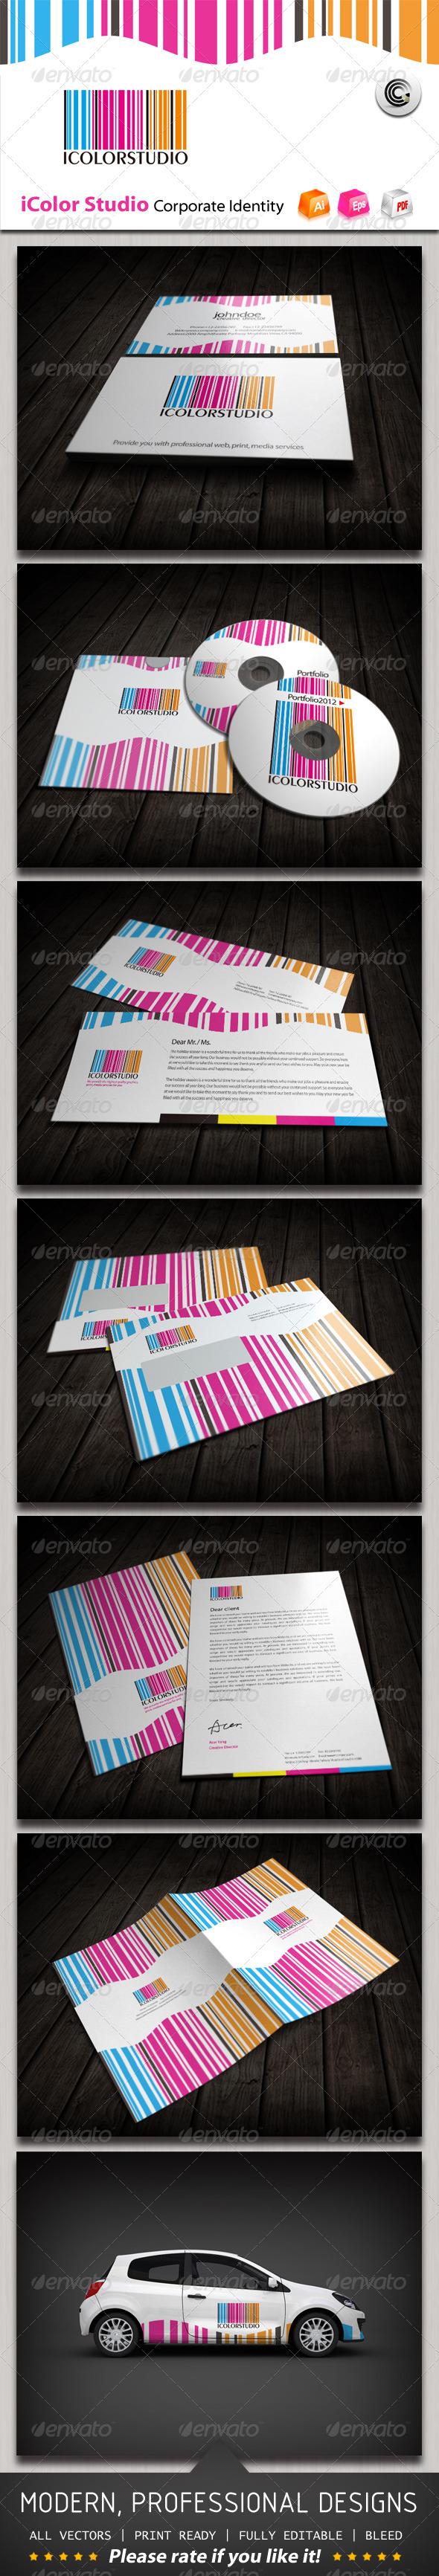 IColor Studio Corporate Identity - Stationery Print Templates